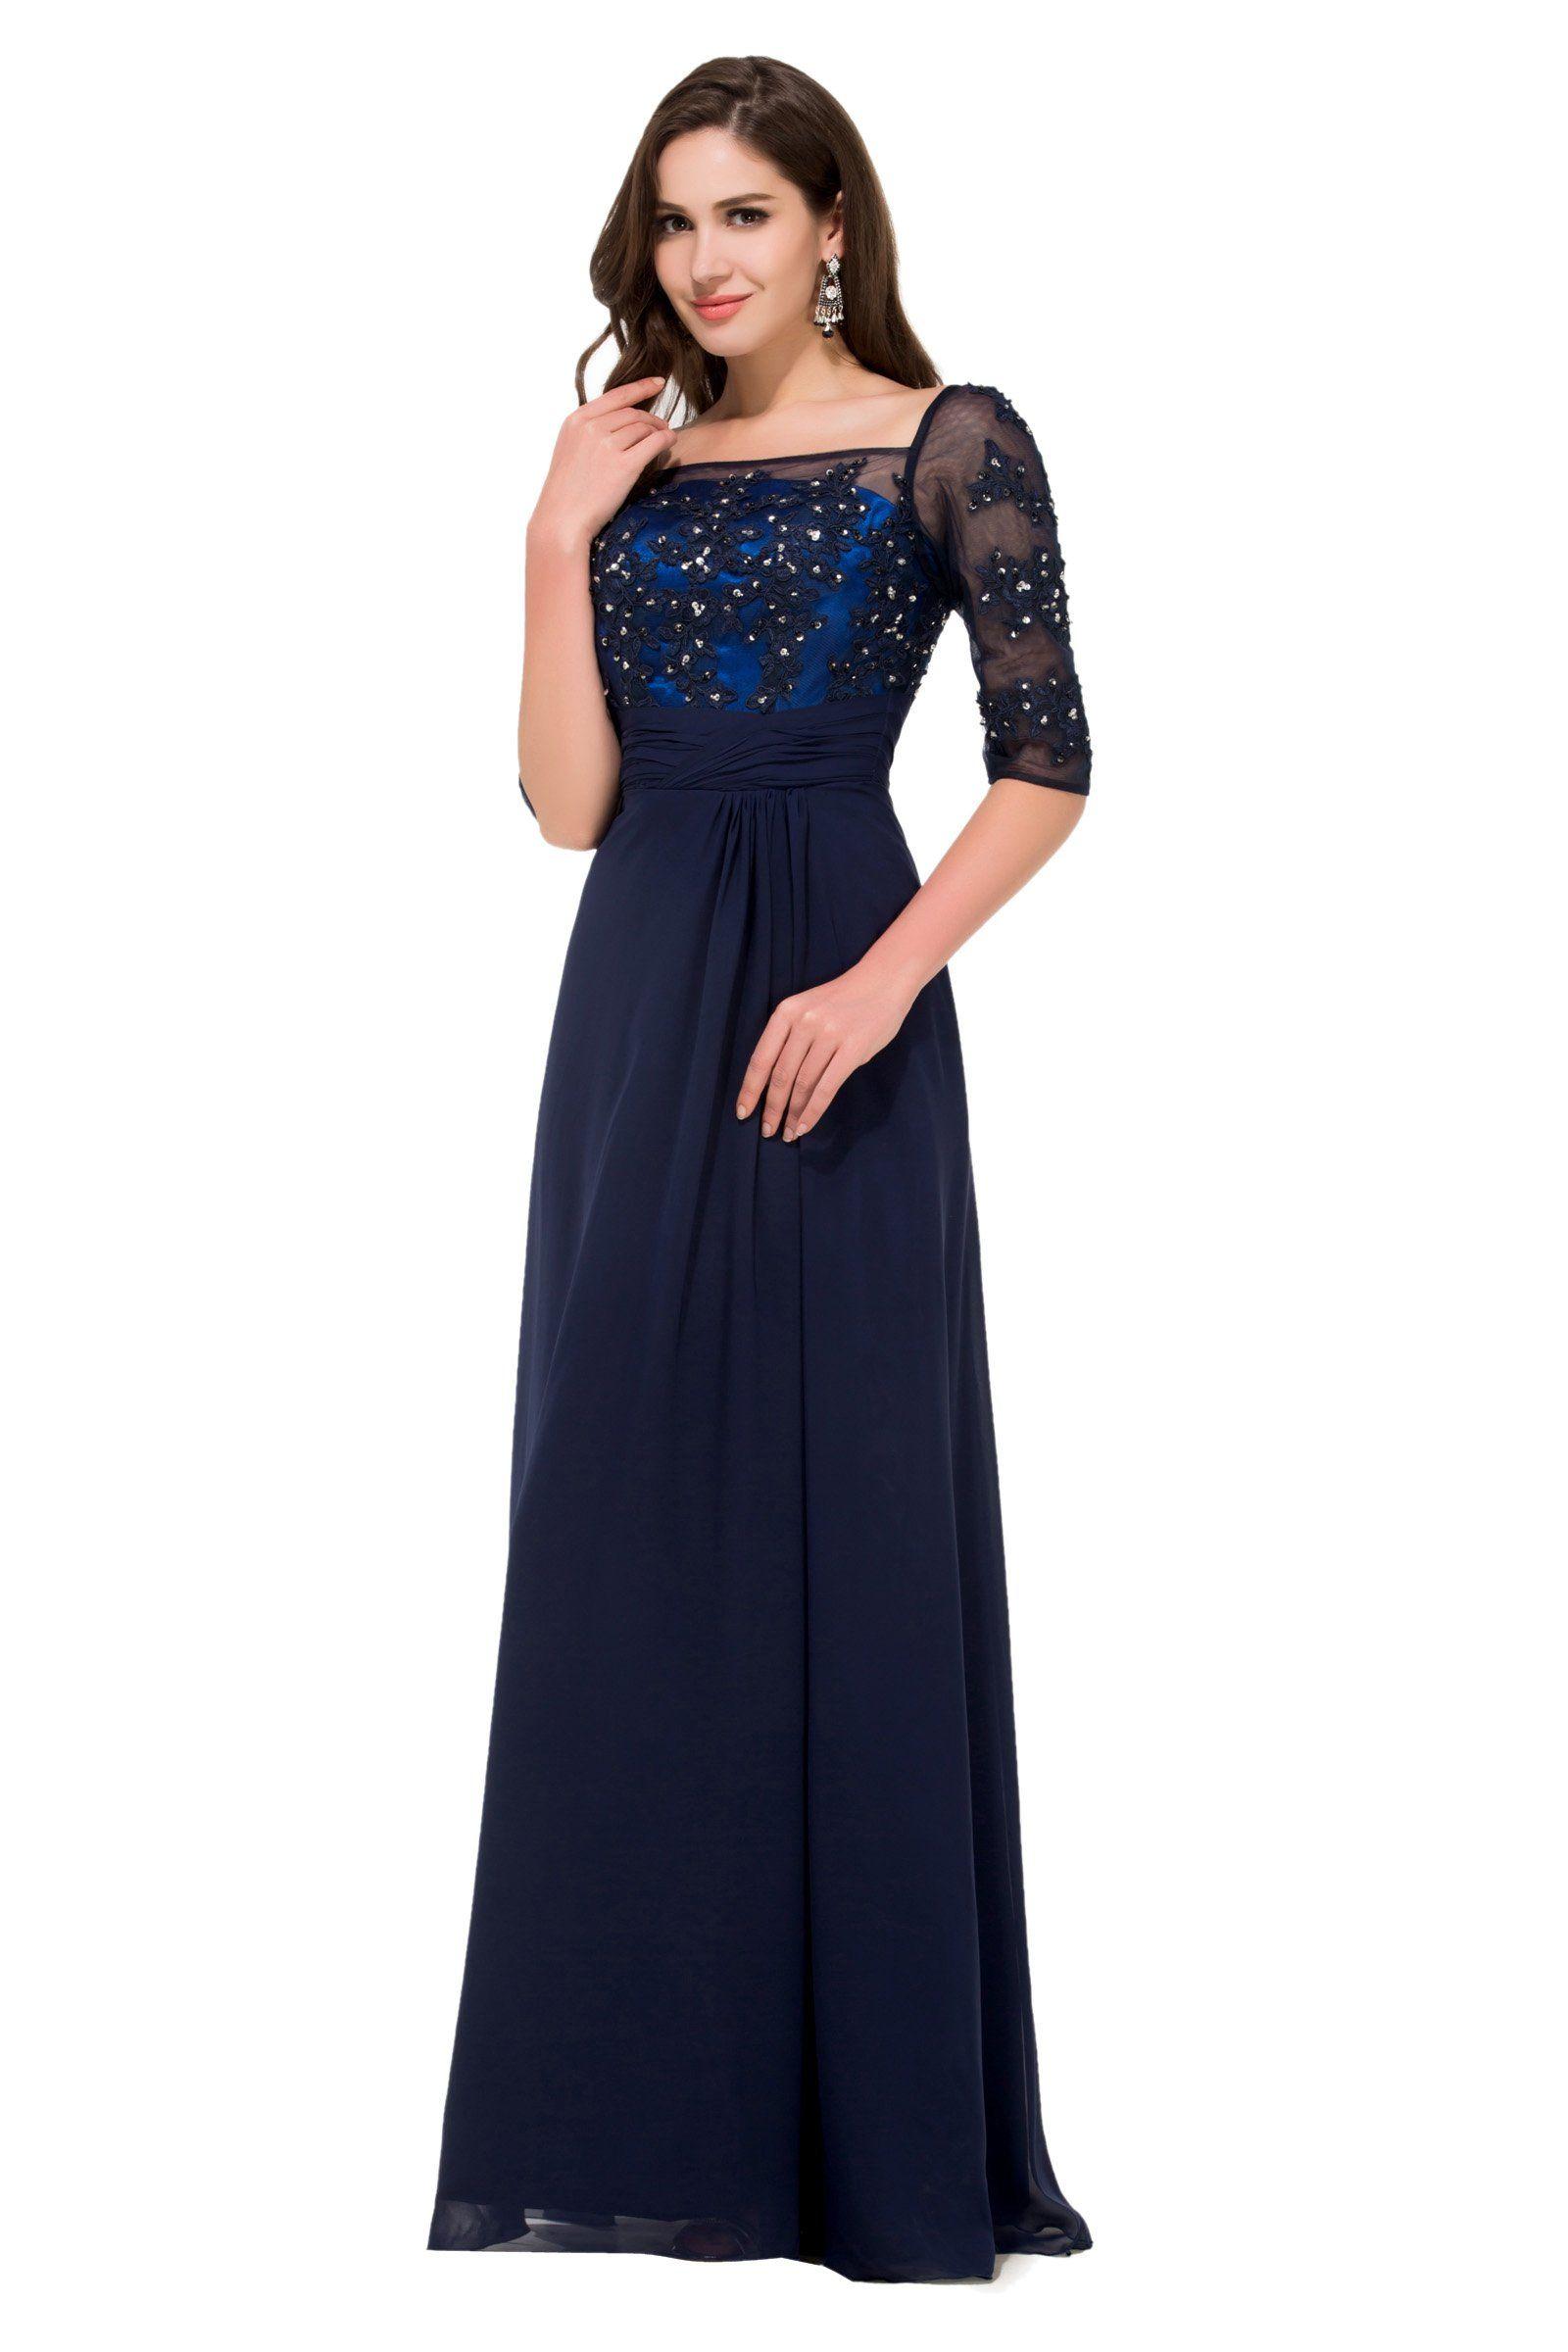 6396b839ec2 GRACE KARIN Navy Blue Short leeve Chiffon Dresses Celebrity Style Cocktail  Evening Prom Dress  Amazon.co.uk  Clothing